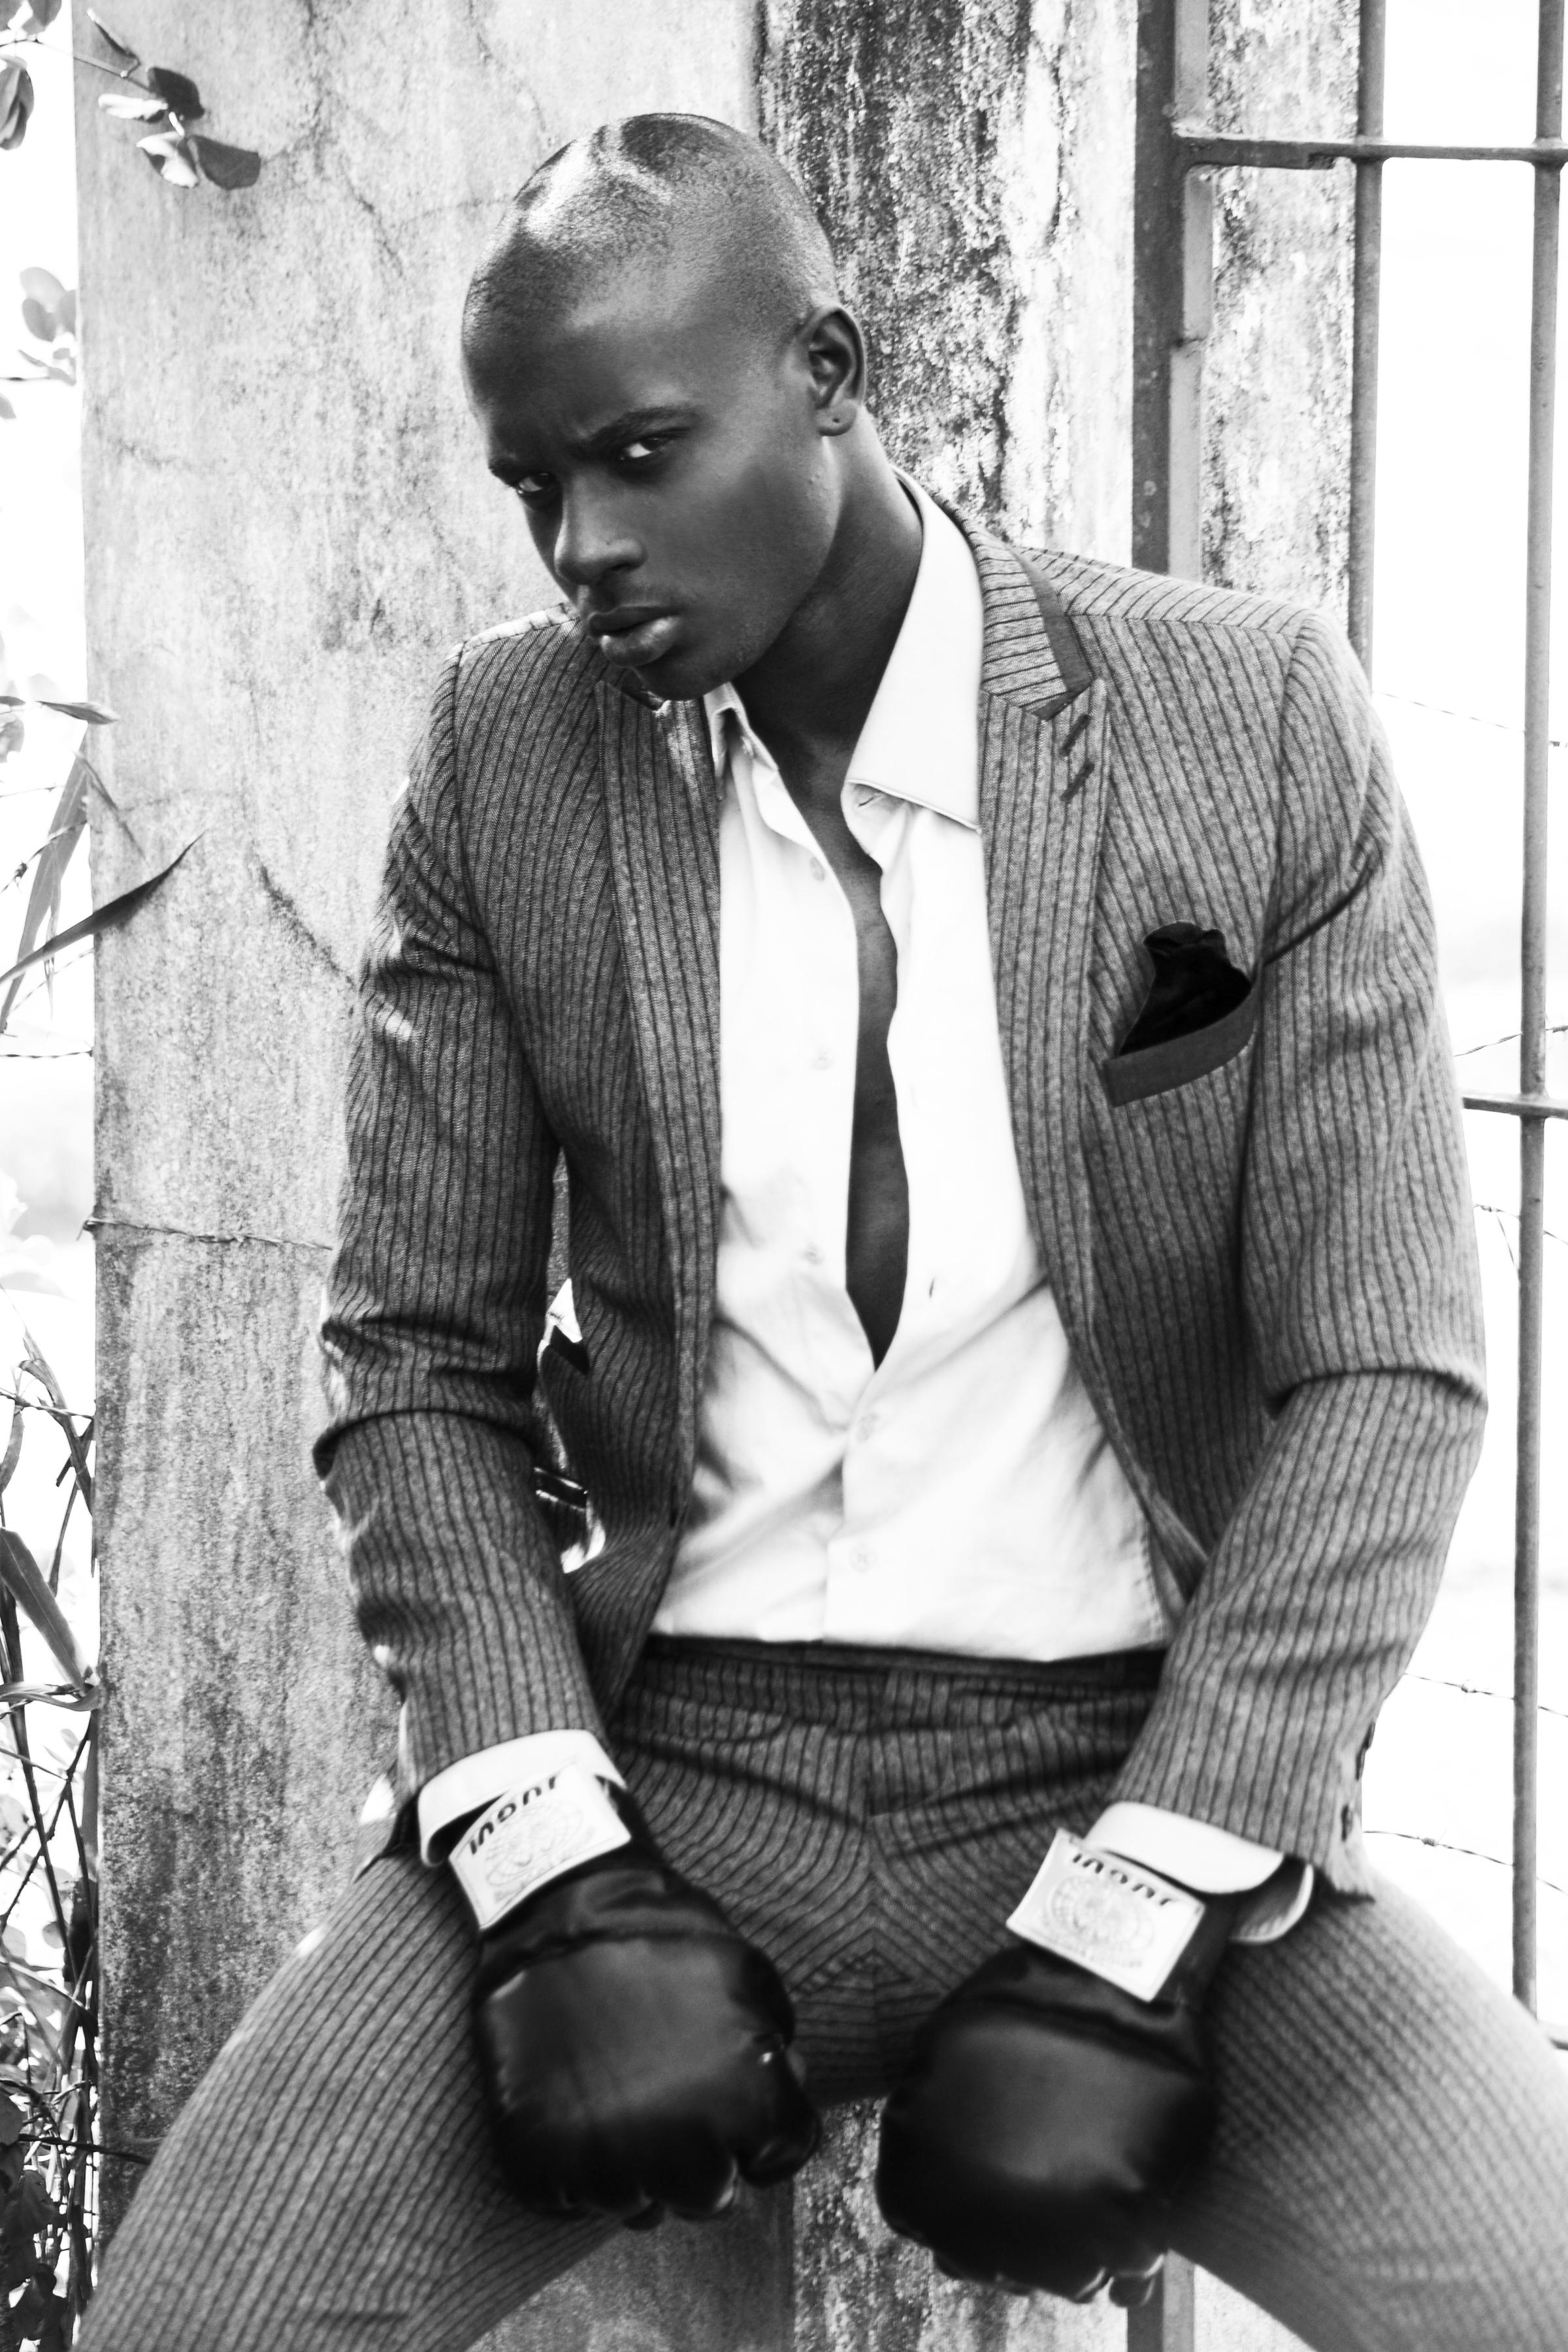 editorial masculino, rodrigo marconatto, alex cursino, moda masculina, dicas de moda, fashion style, fashion magazine, model brazil, moda sem censura, youtuber, menswear, grooming, modelo afro (2)